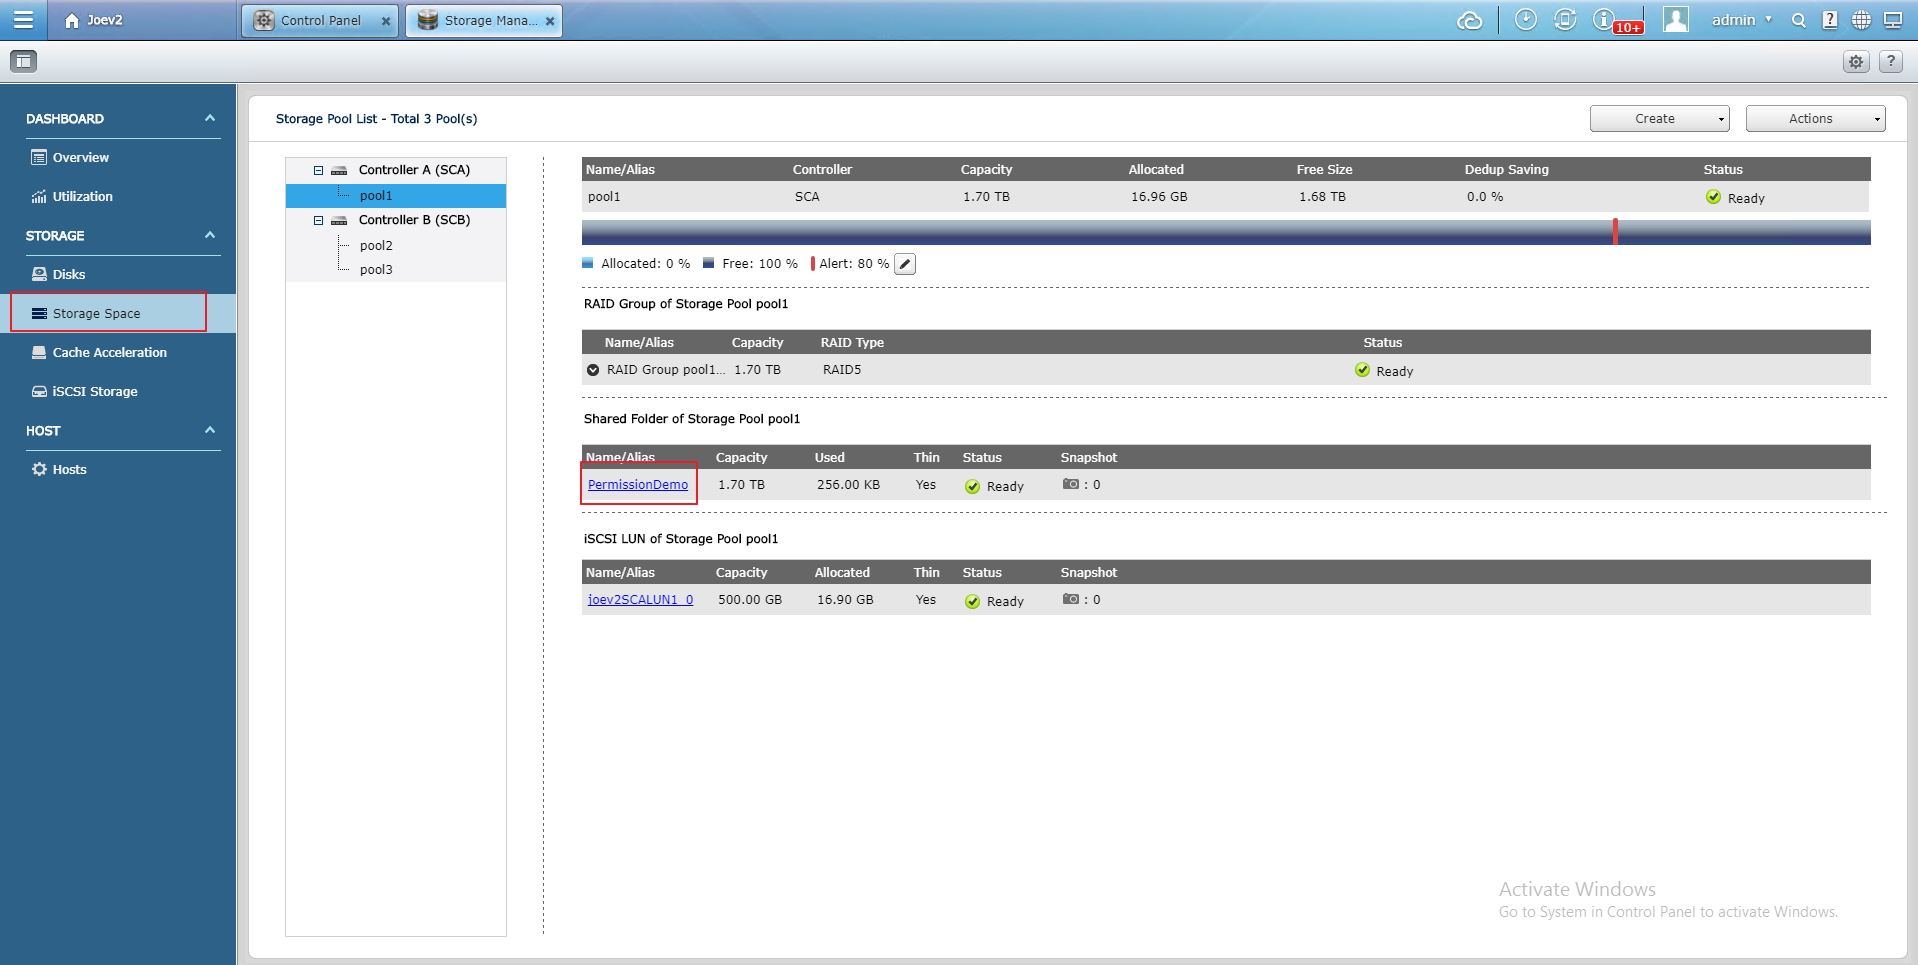 Configuring Microsoft Windows Shared Folder Permissions in